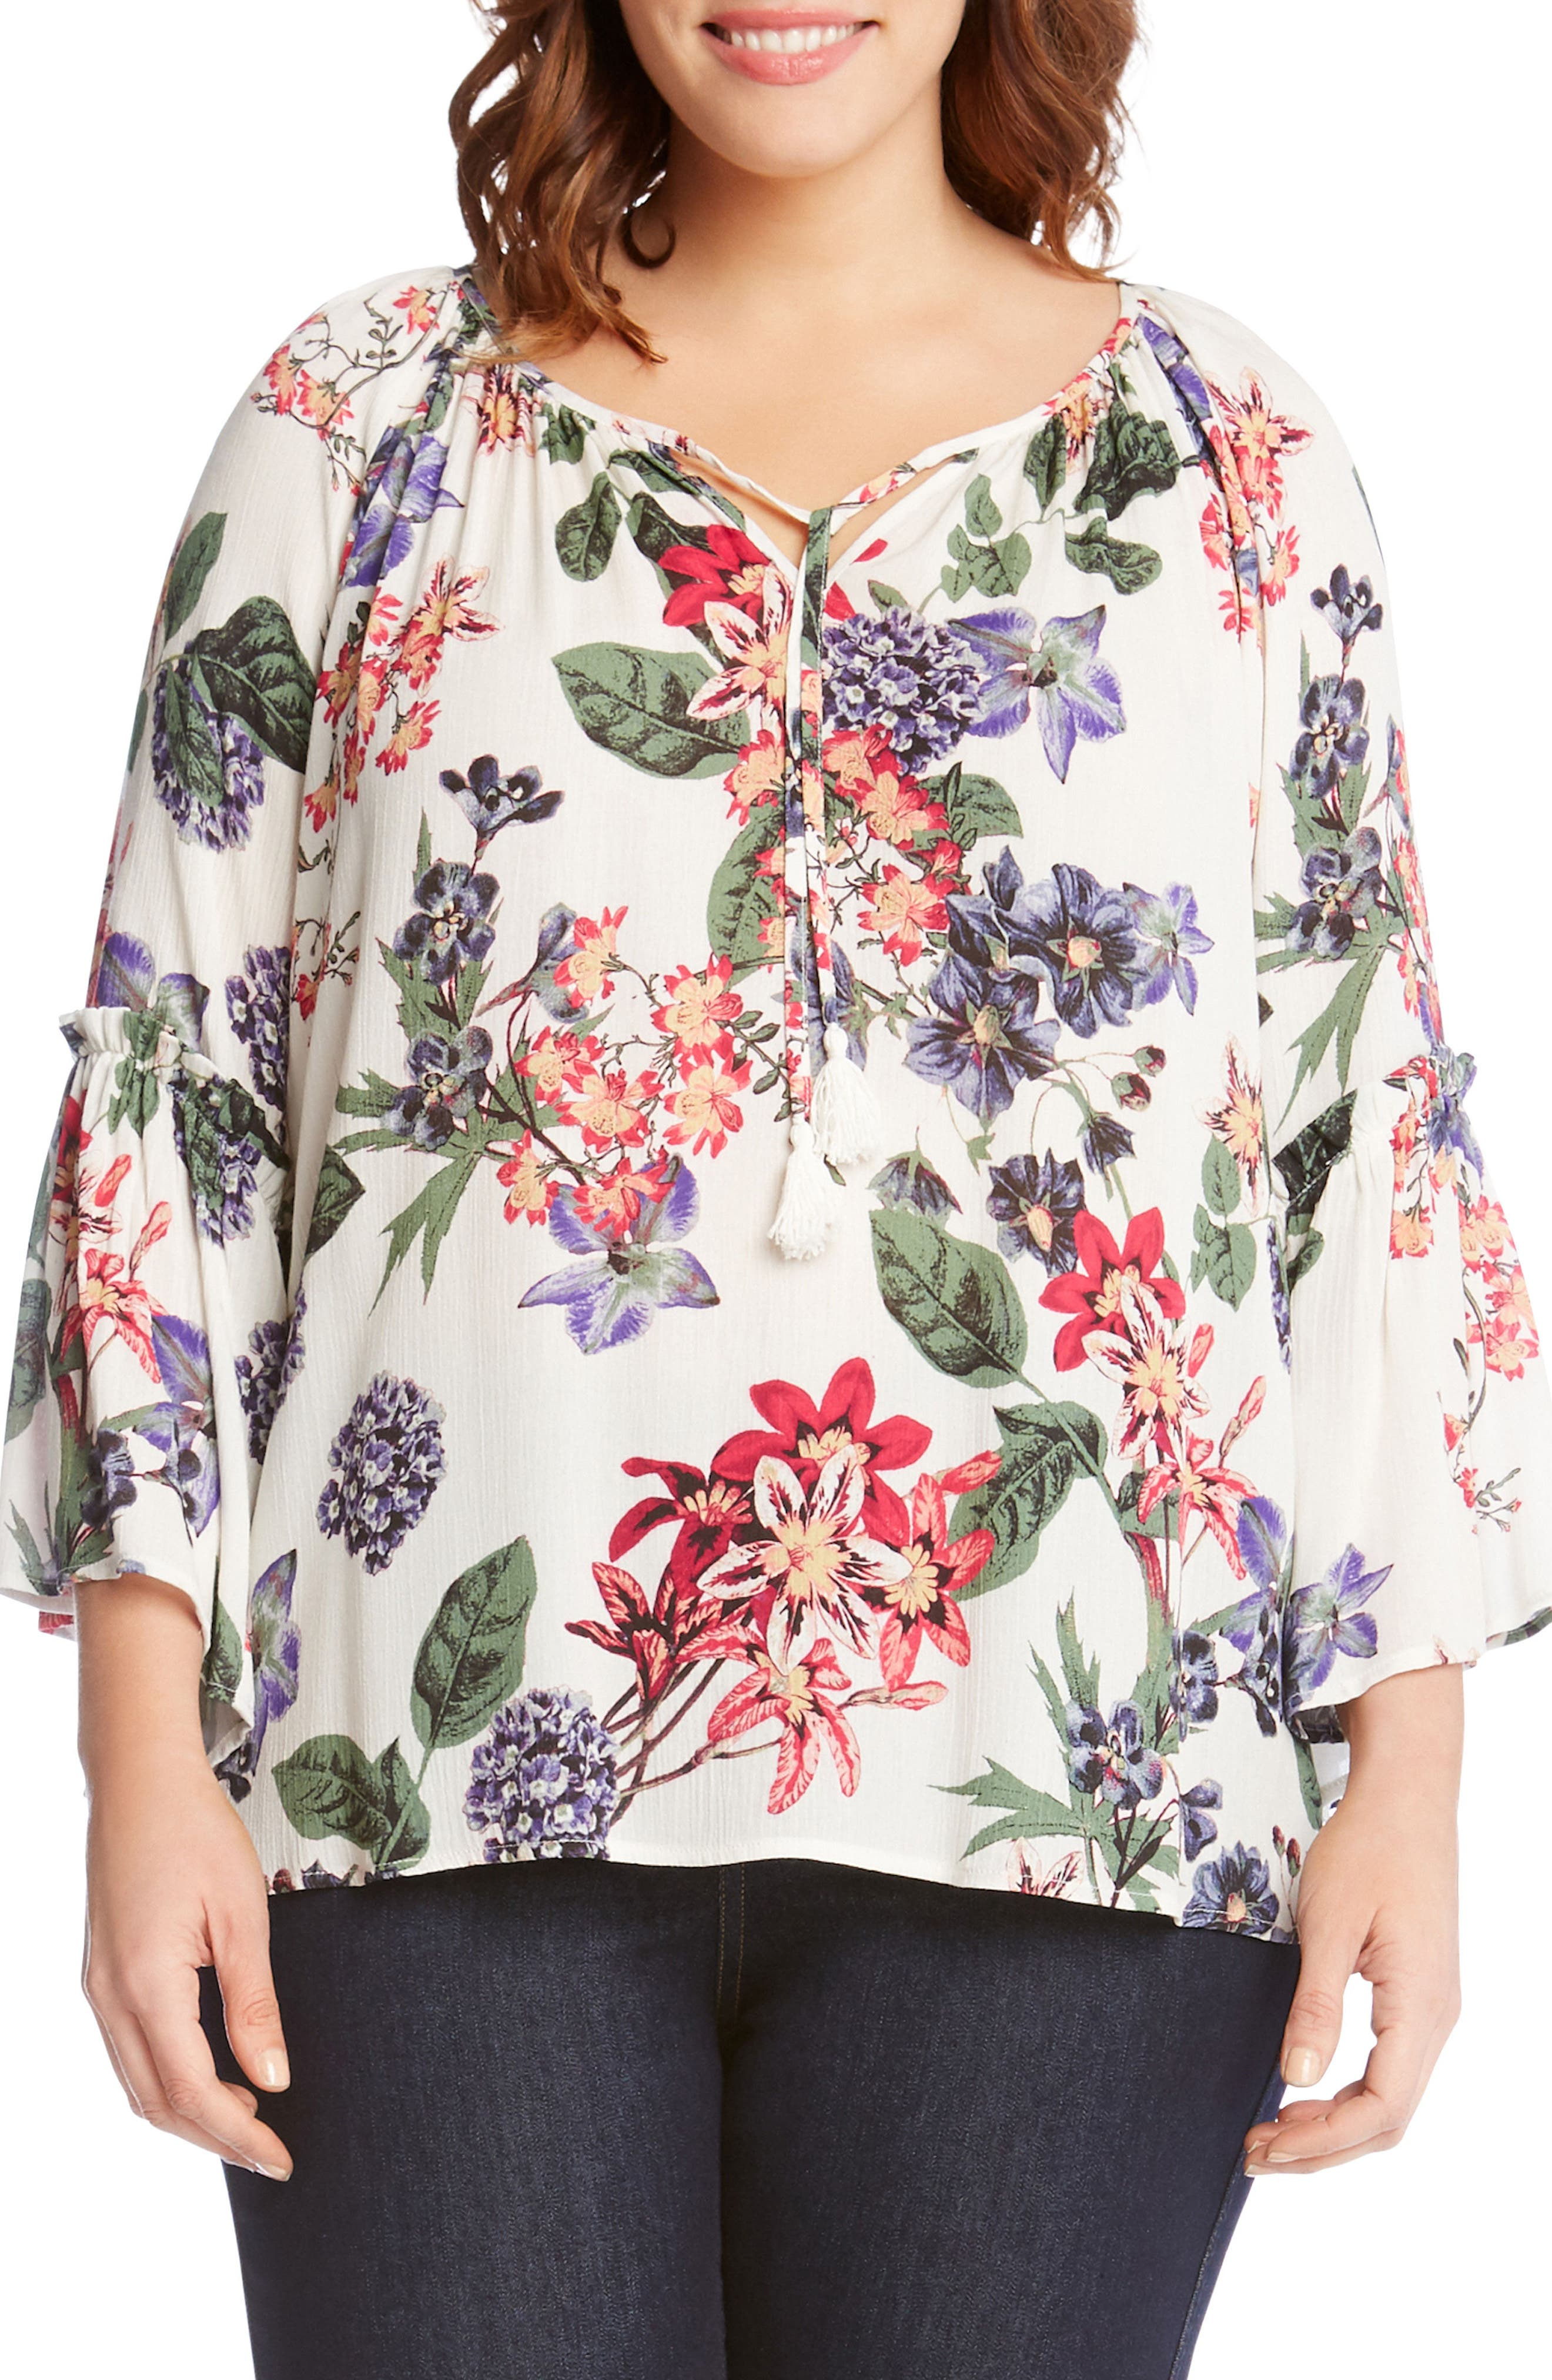 KAREN KANE Ruffle Sleeve Floral Top, Main, color, 108